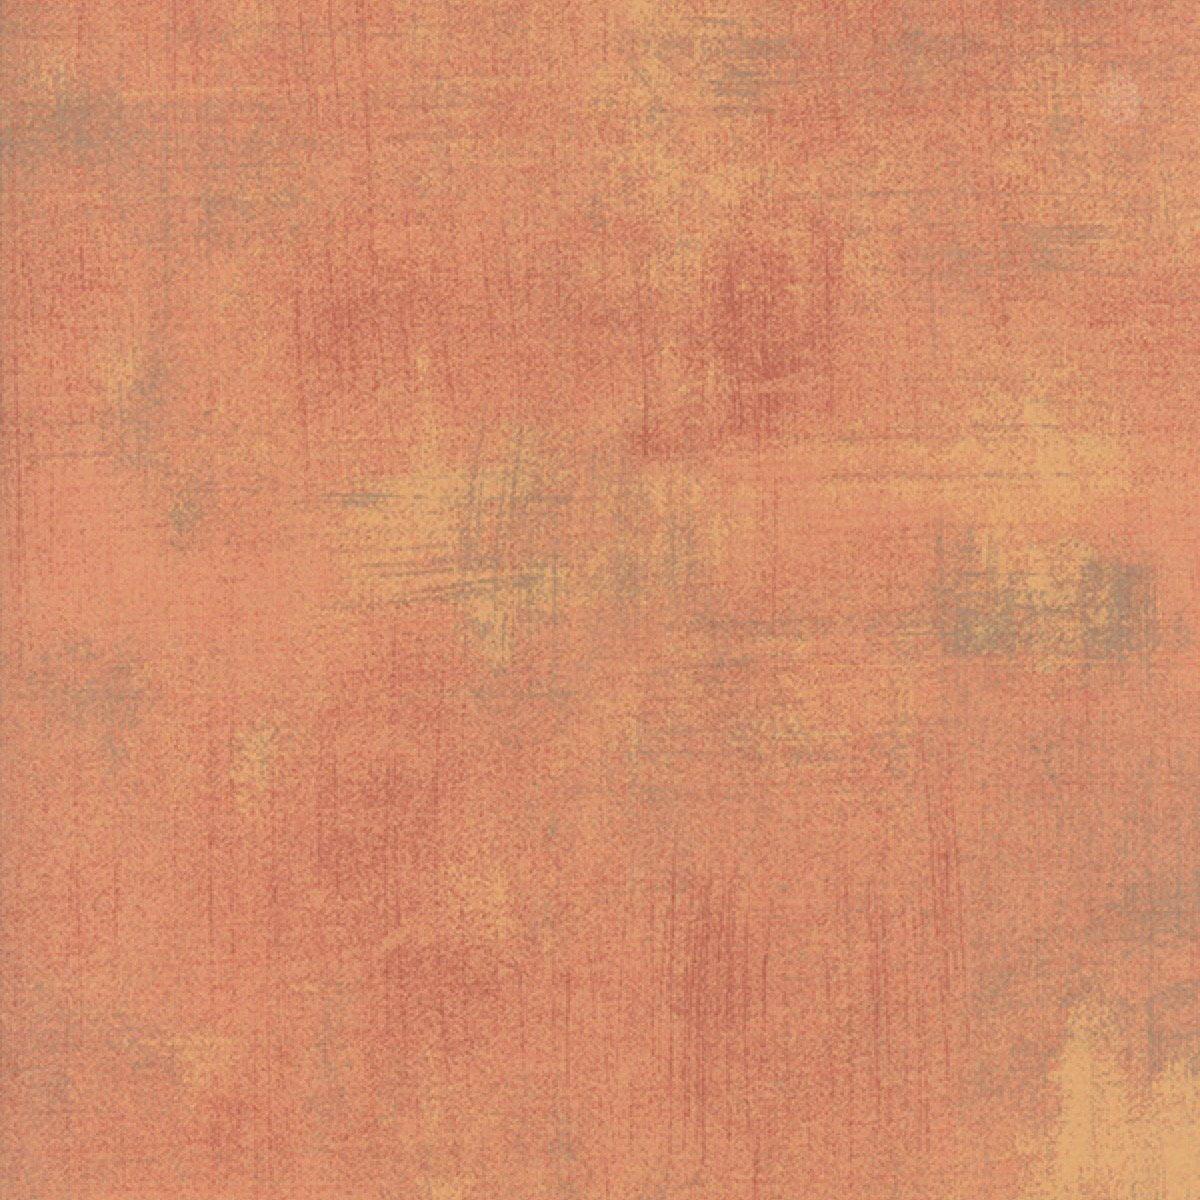 Moda Fabrics Grunge Texture New Colors 2017~ Cantaloupe Cotton Fabric